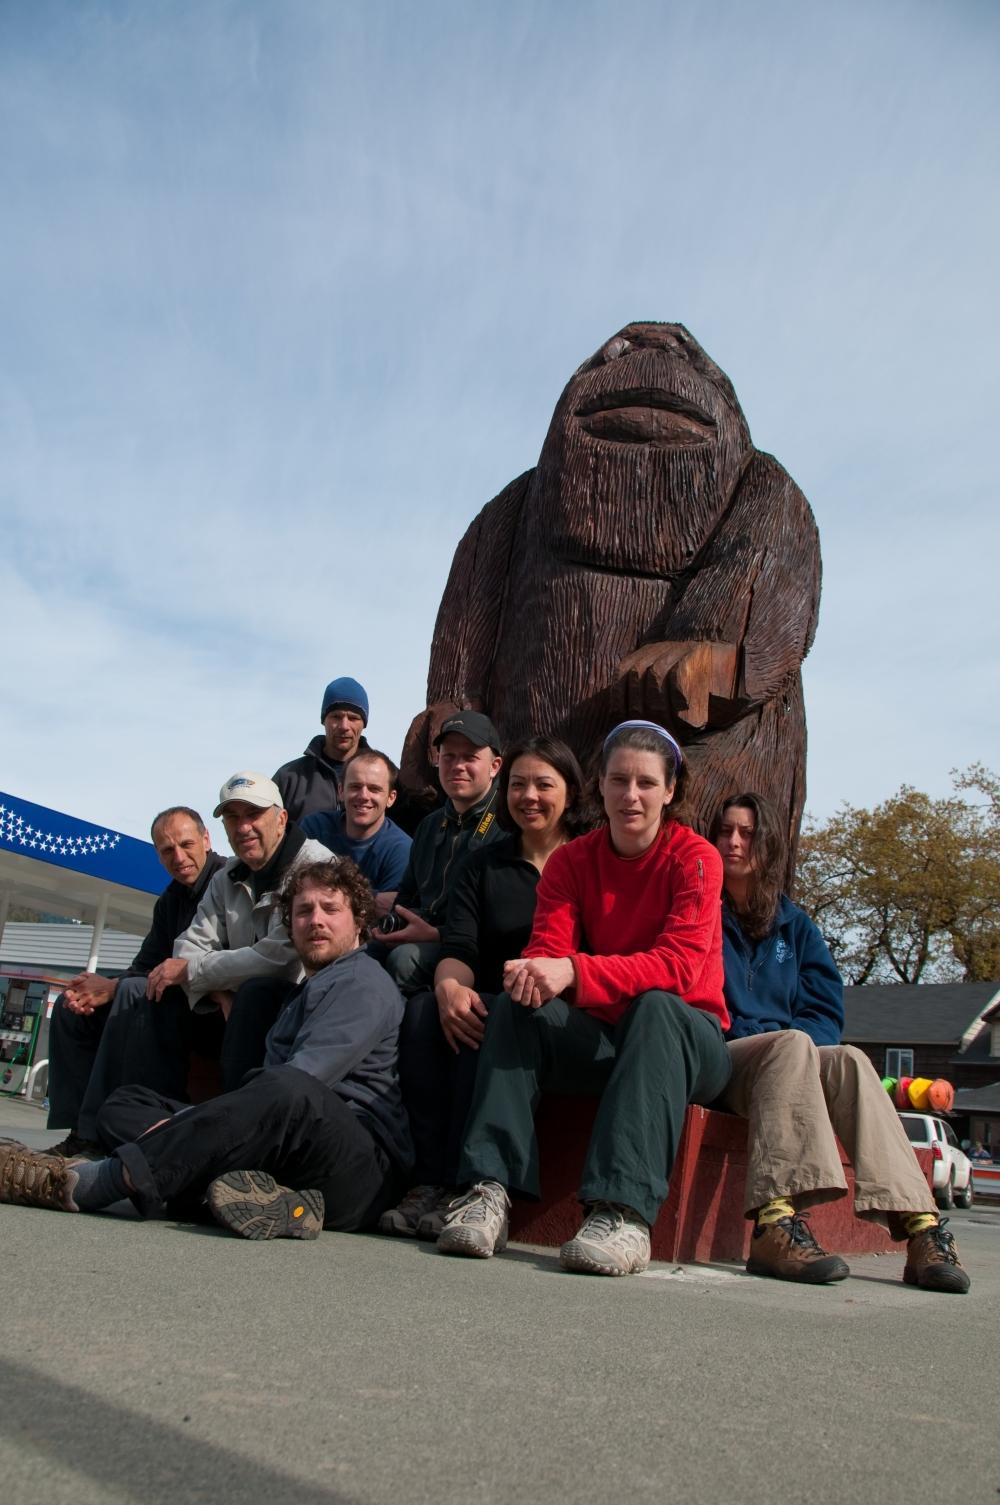 Team Cali feat. bigfoot